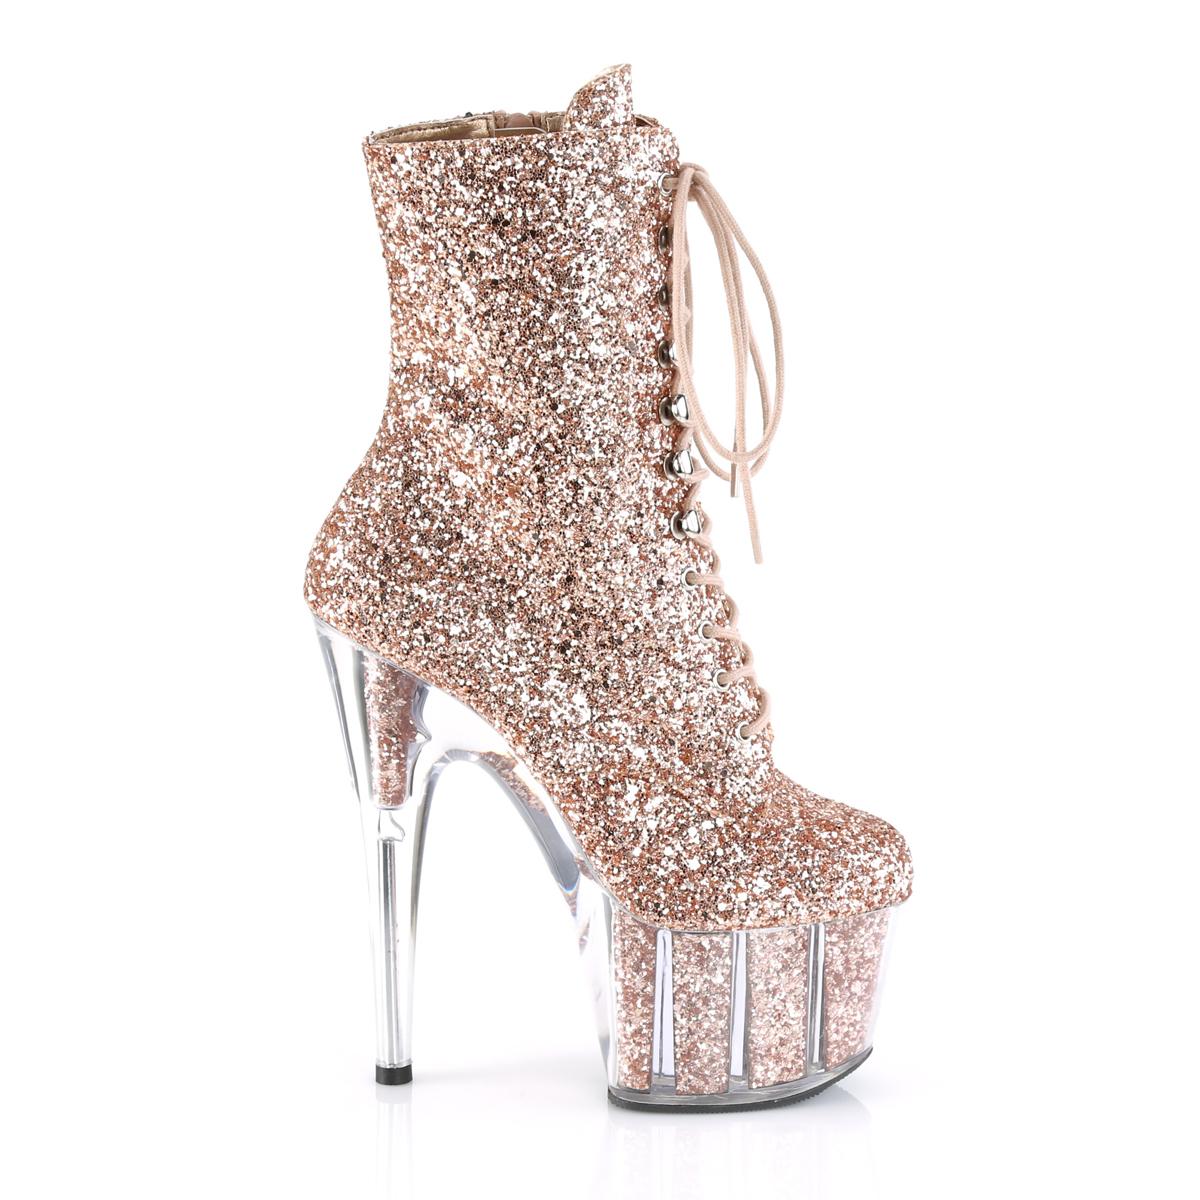 Koperen glitter 18 cm ADORE 1020G dames enkellaarsjes met plateauzool